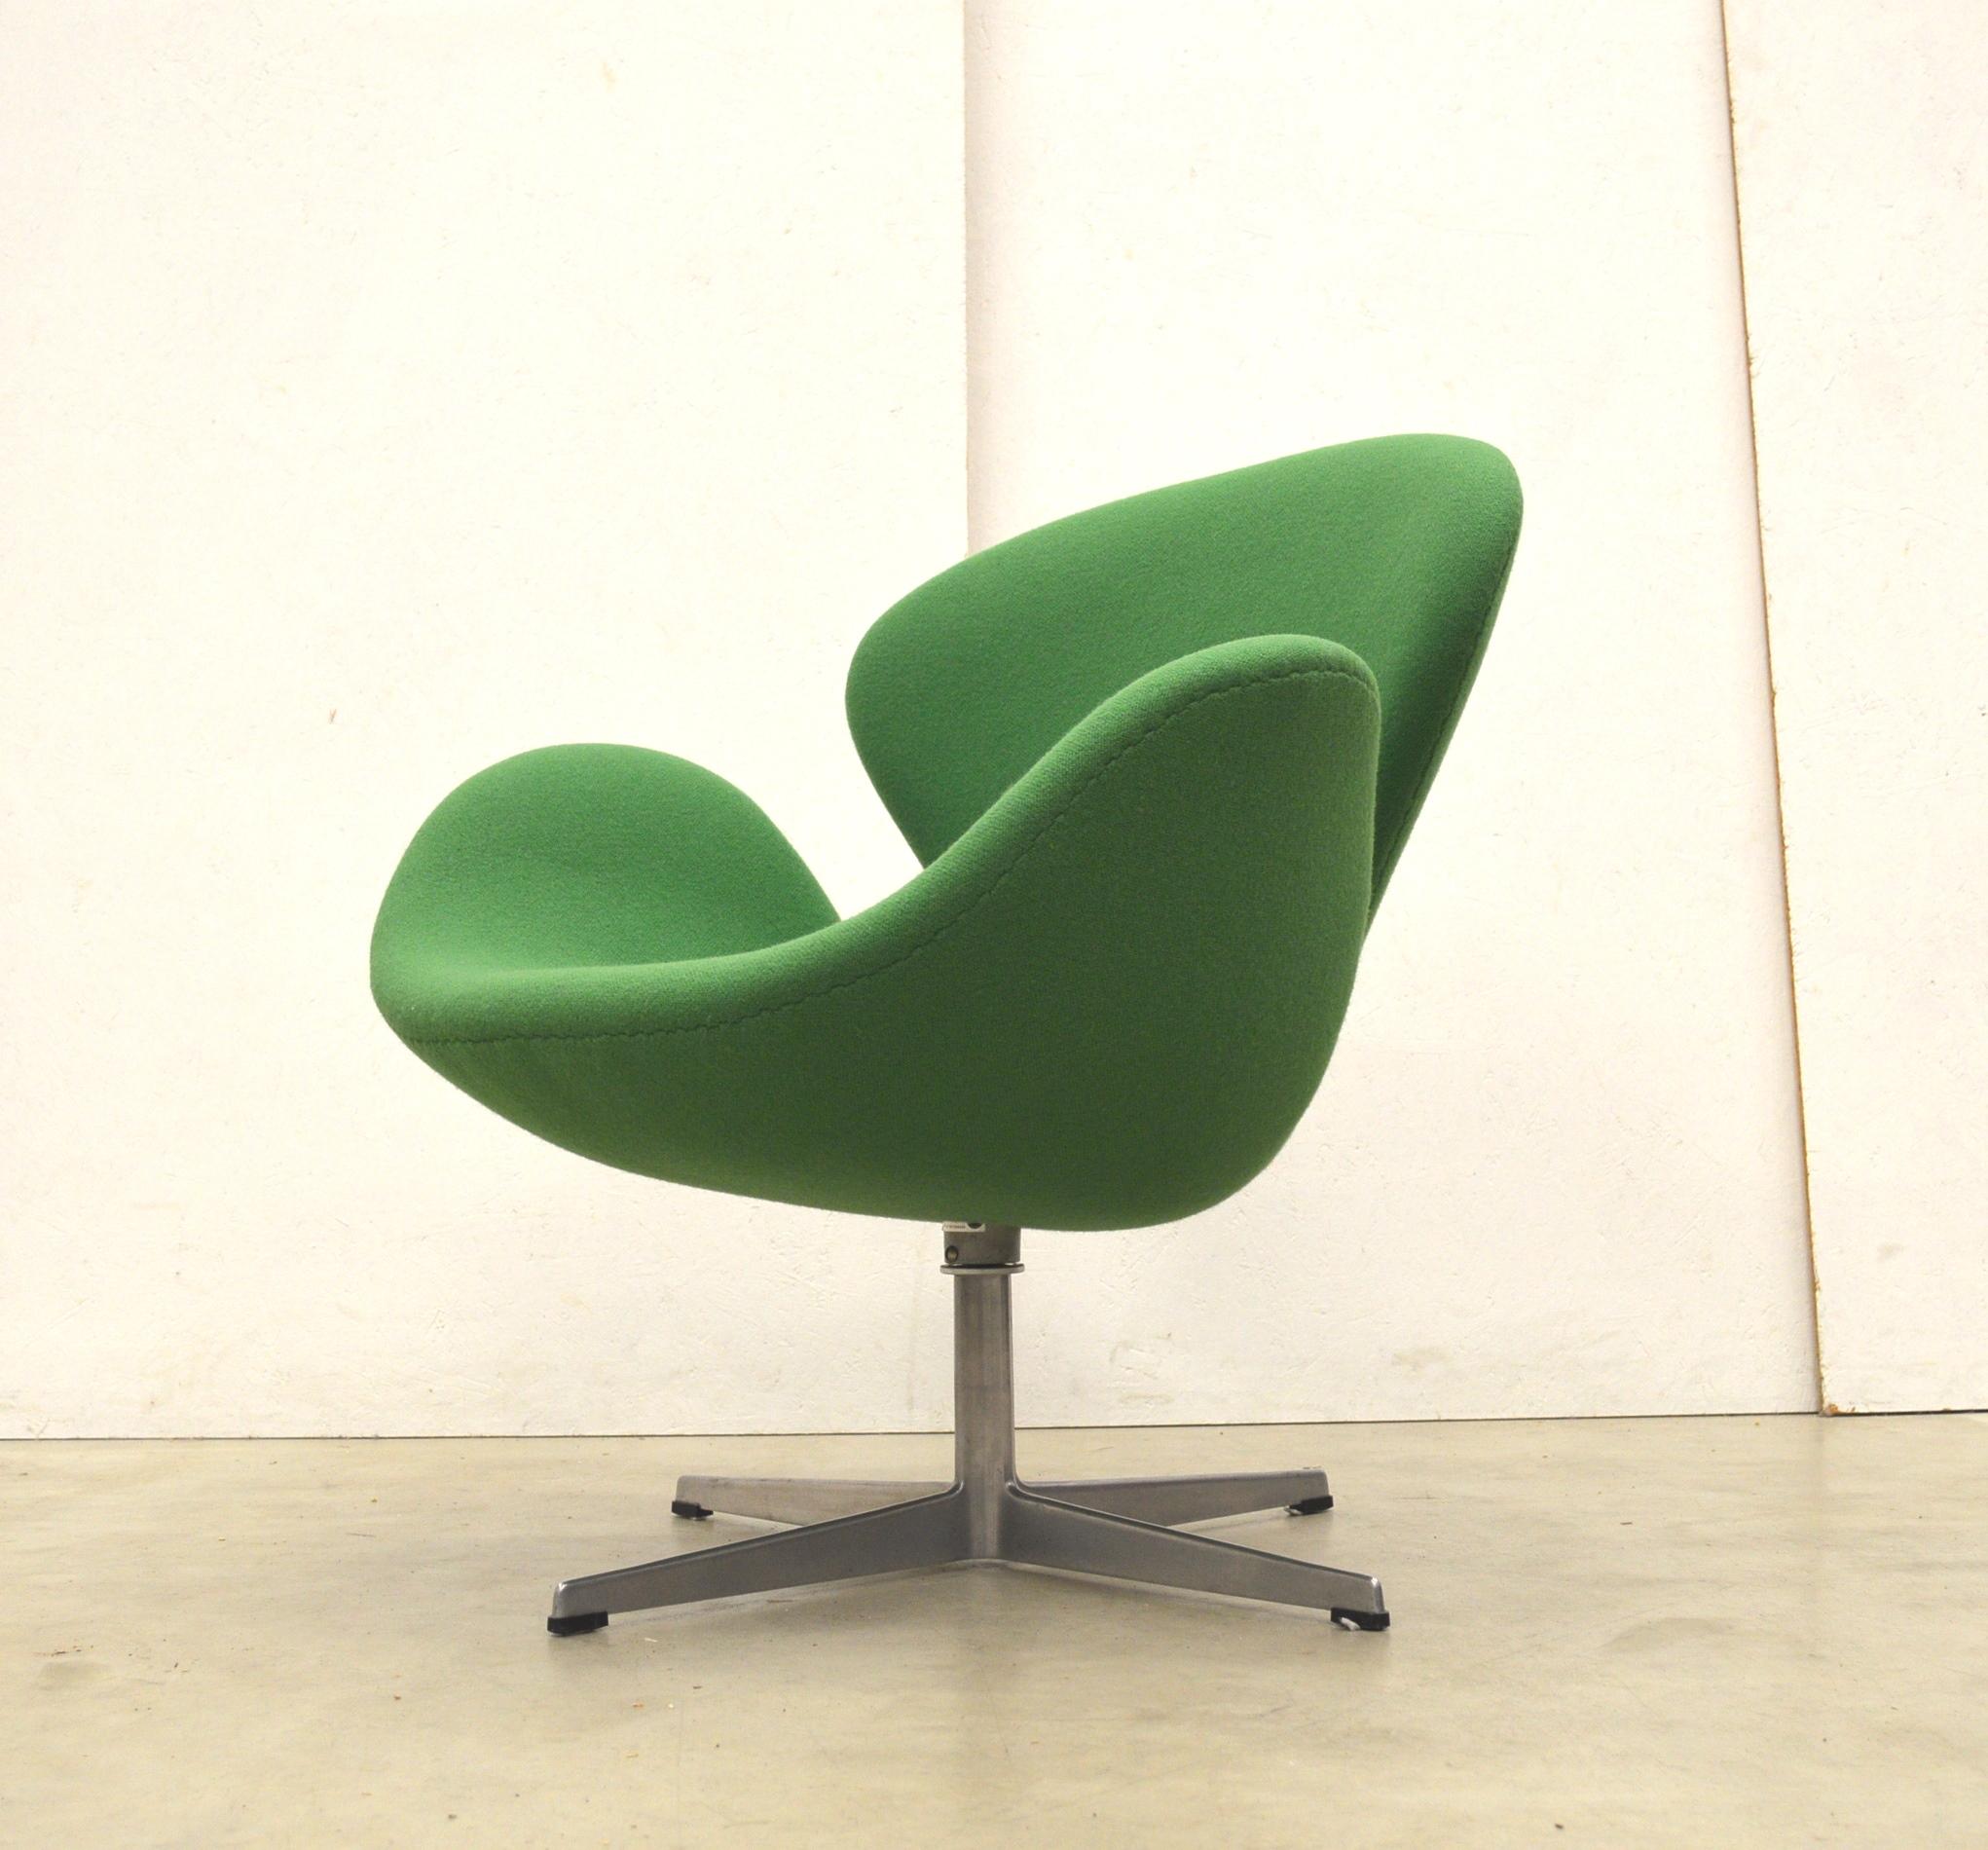 Early Green Fritz Hansen Swan Chair By Arne Jacobsen 1969 Interior